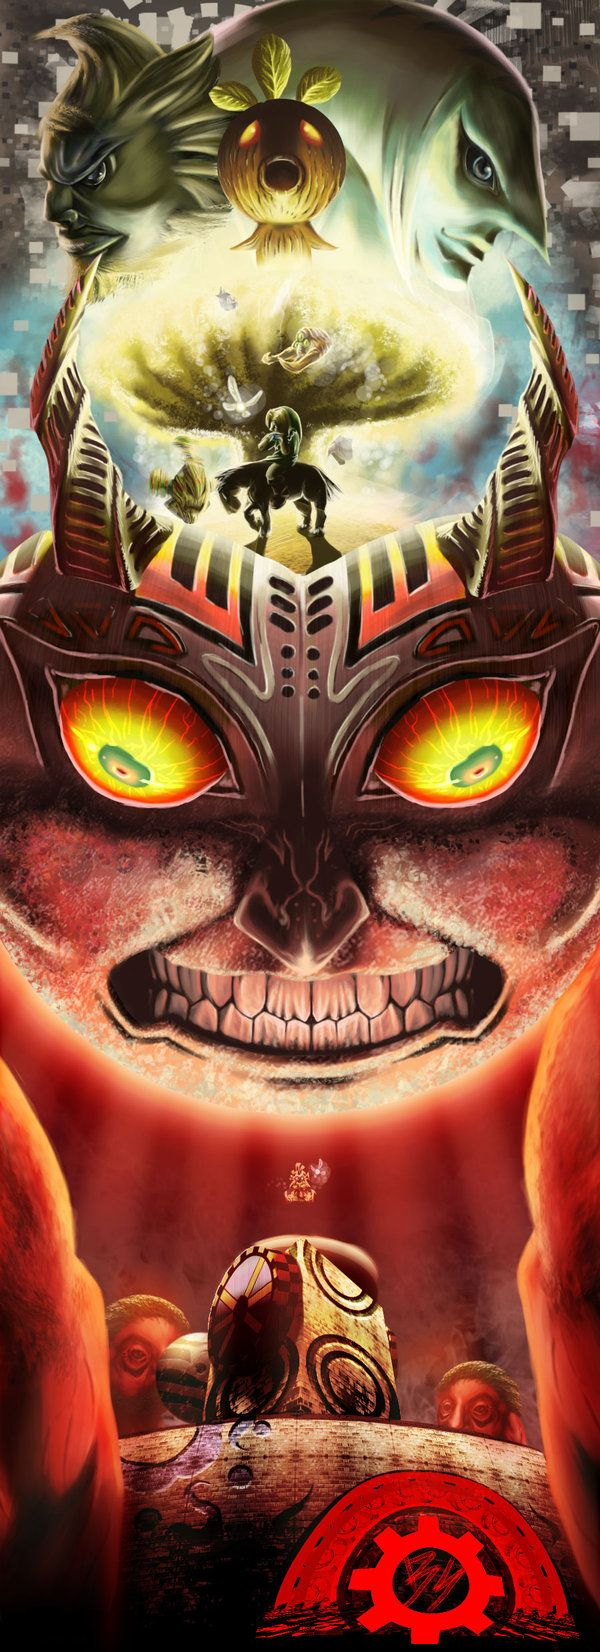 91 best majora's mask images on Pinterest